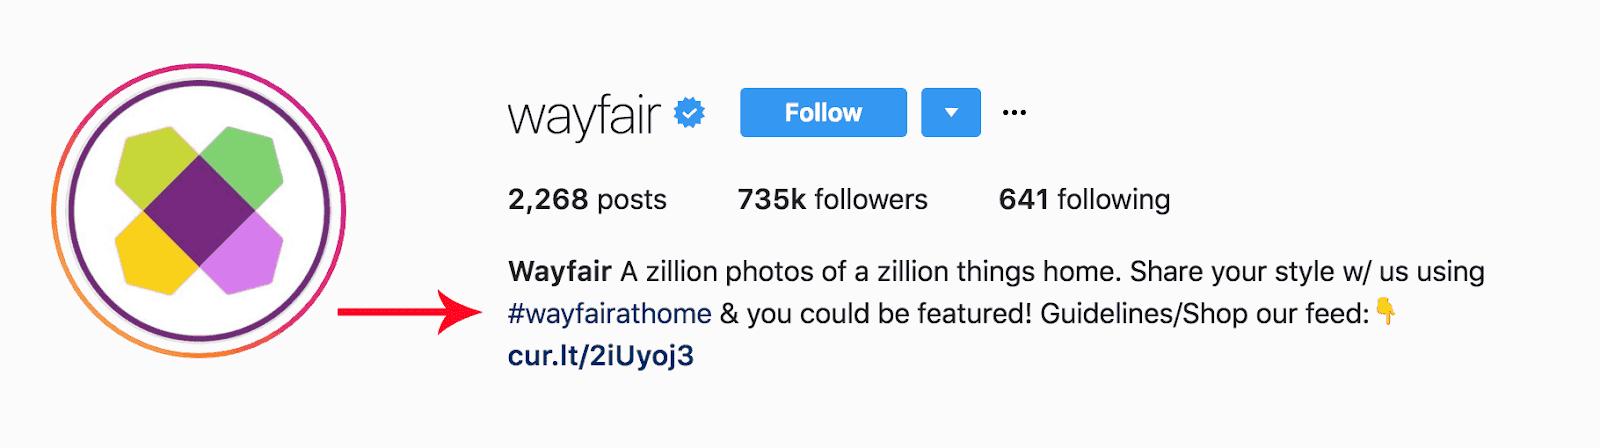 Screenshot showing an instagram profile